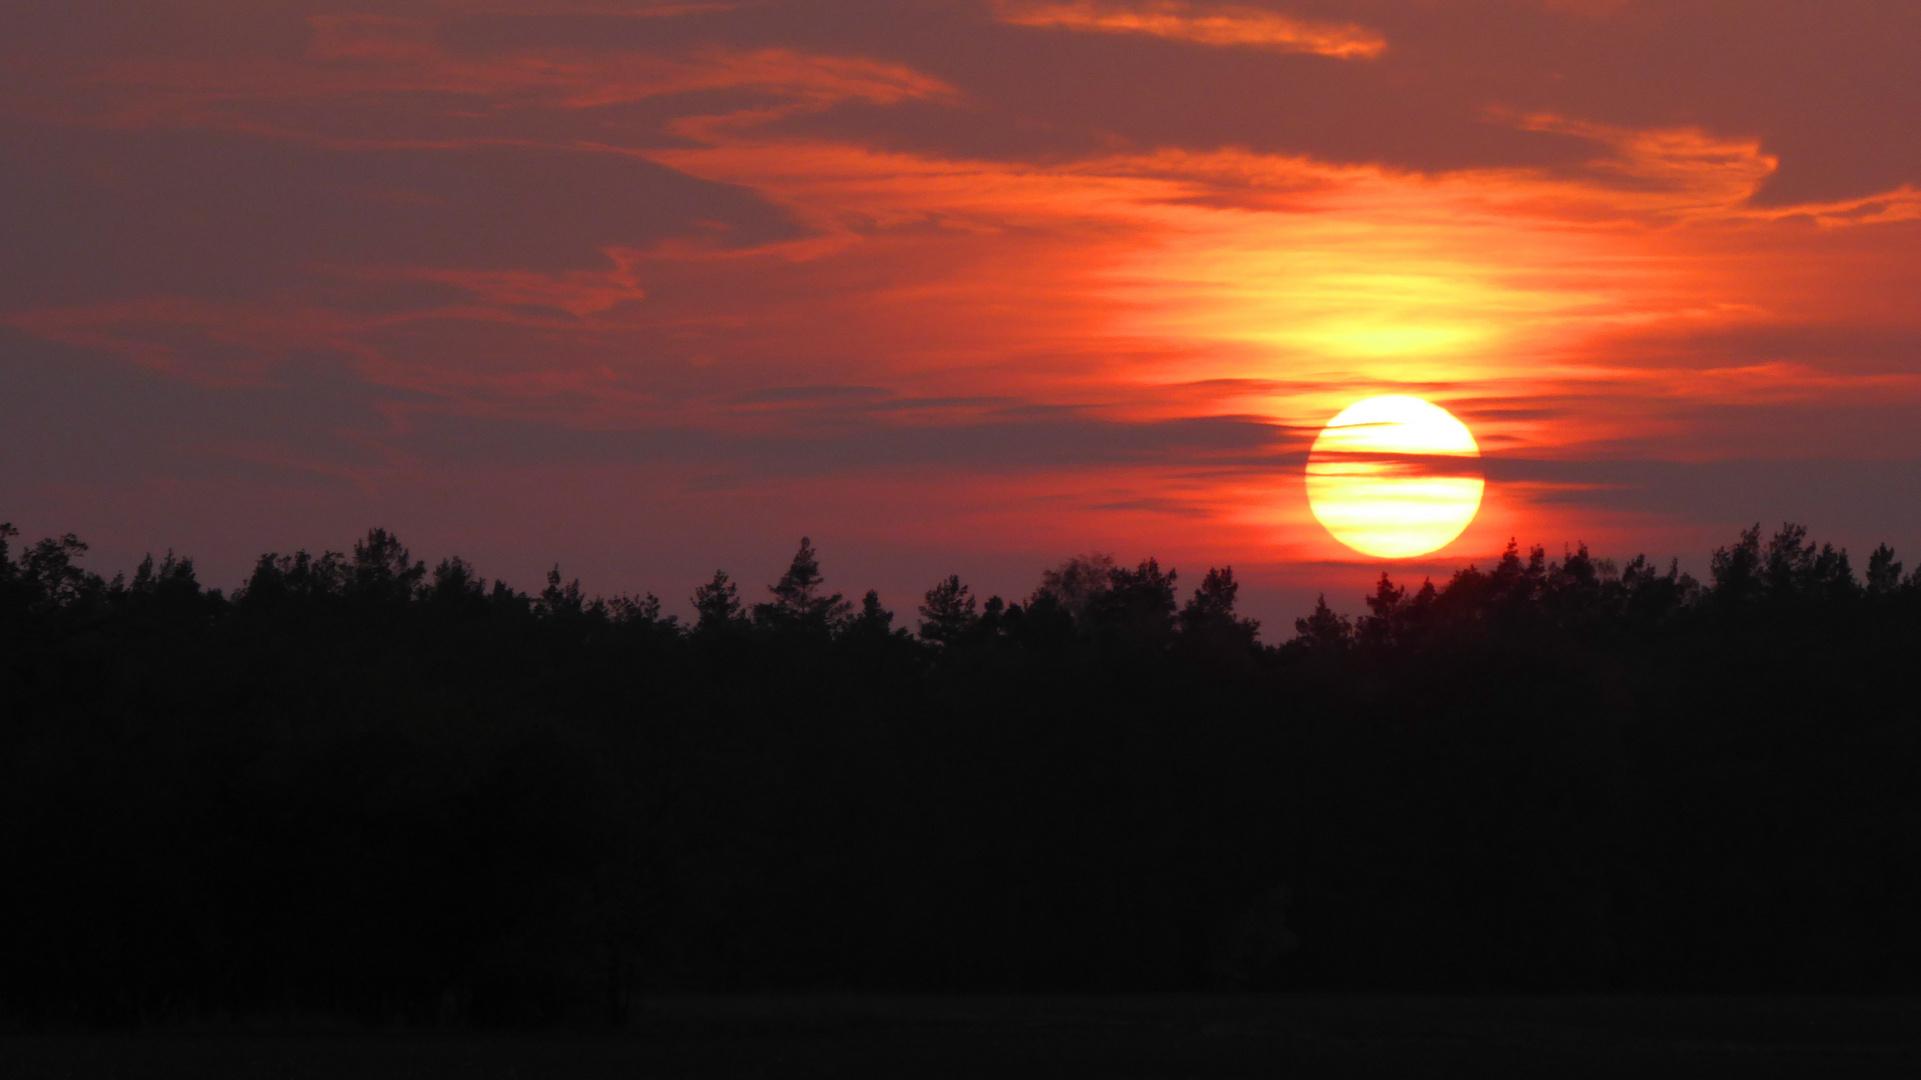 Sonnenuntergang heute Abend